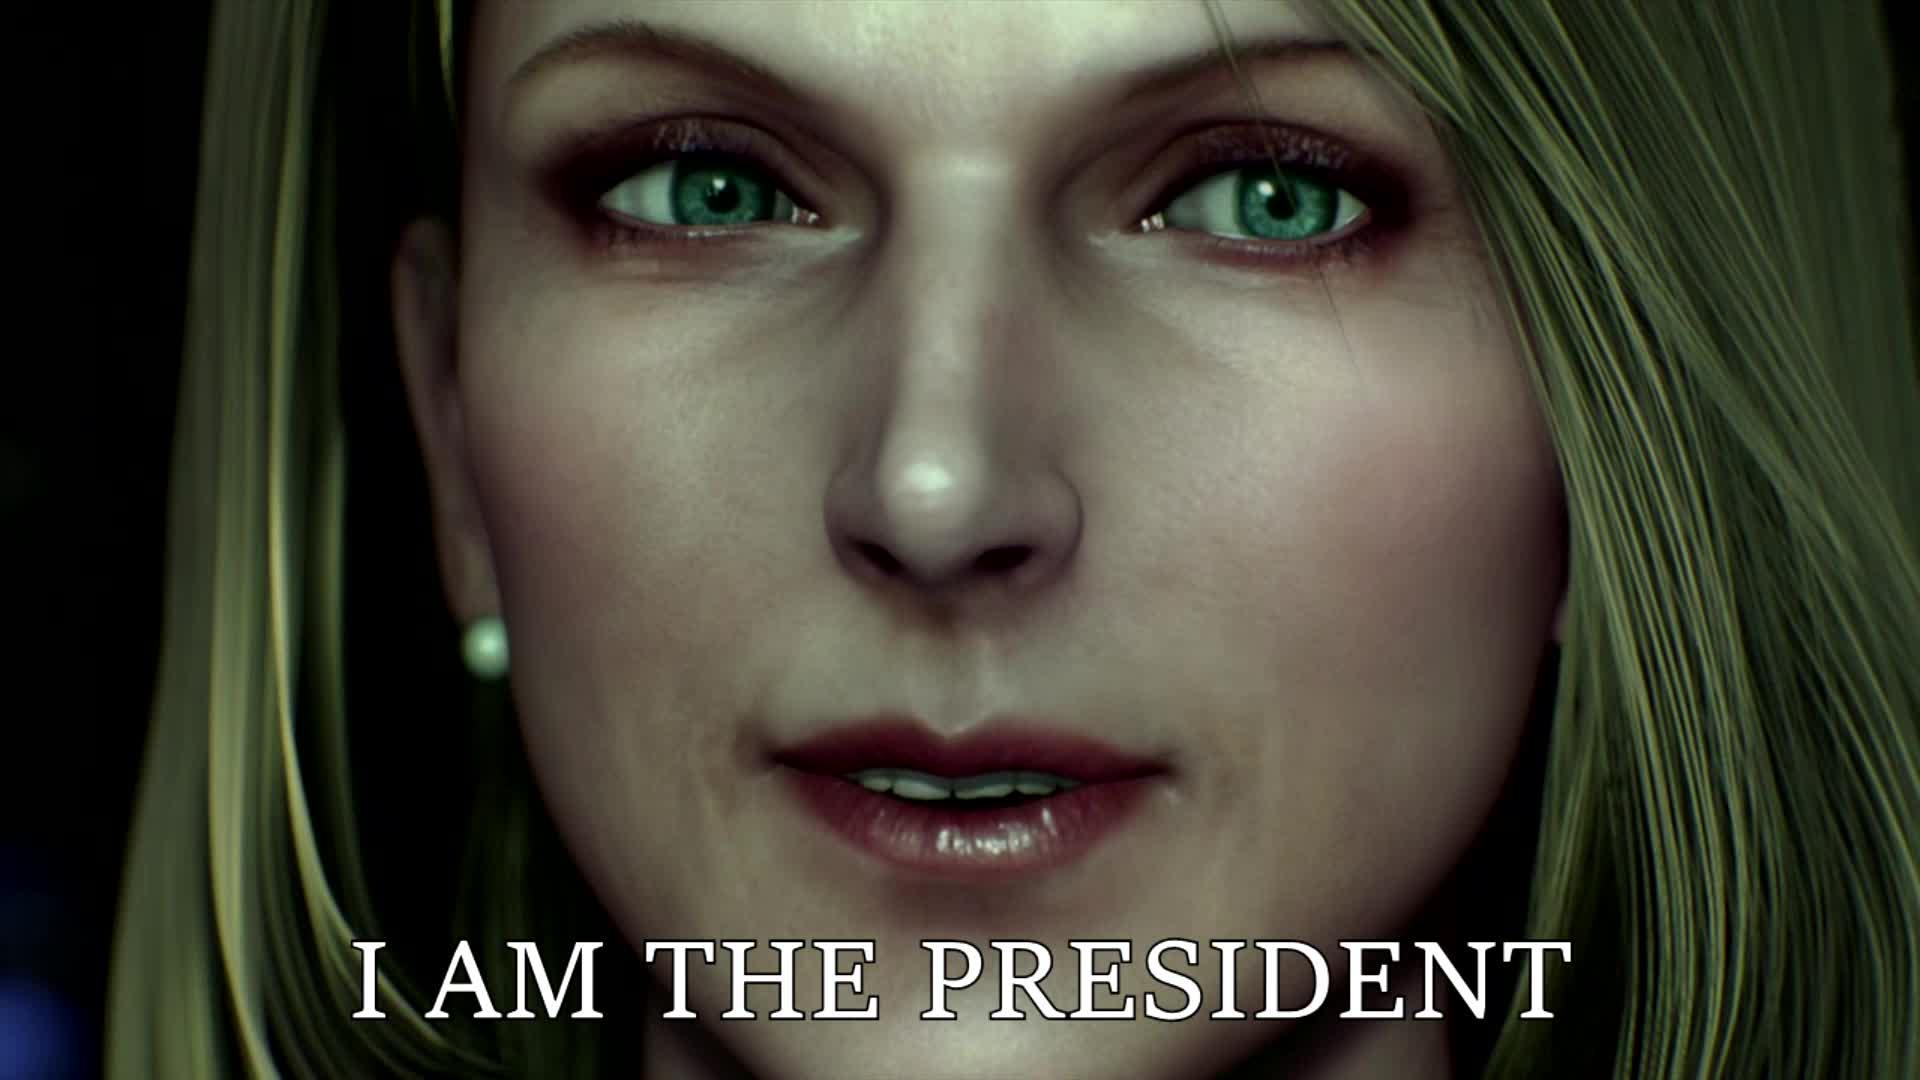 hillary clinton, politics, What Hillary Clinton fantasizes about GIFs